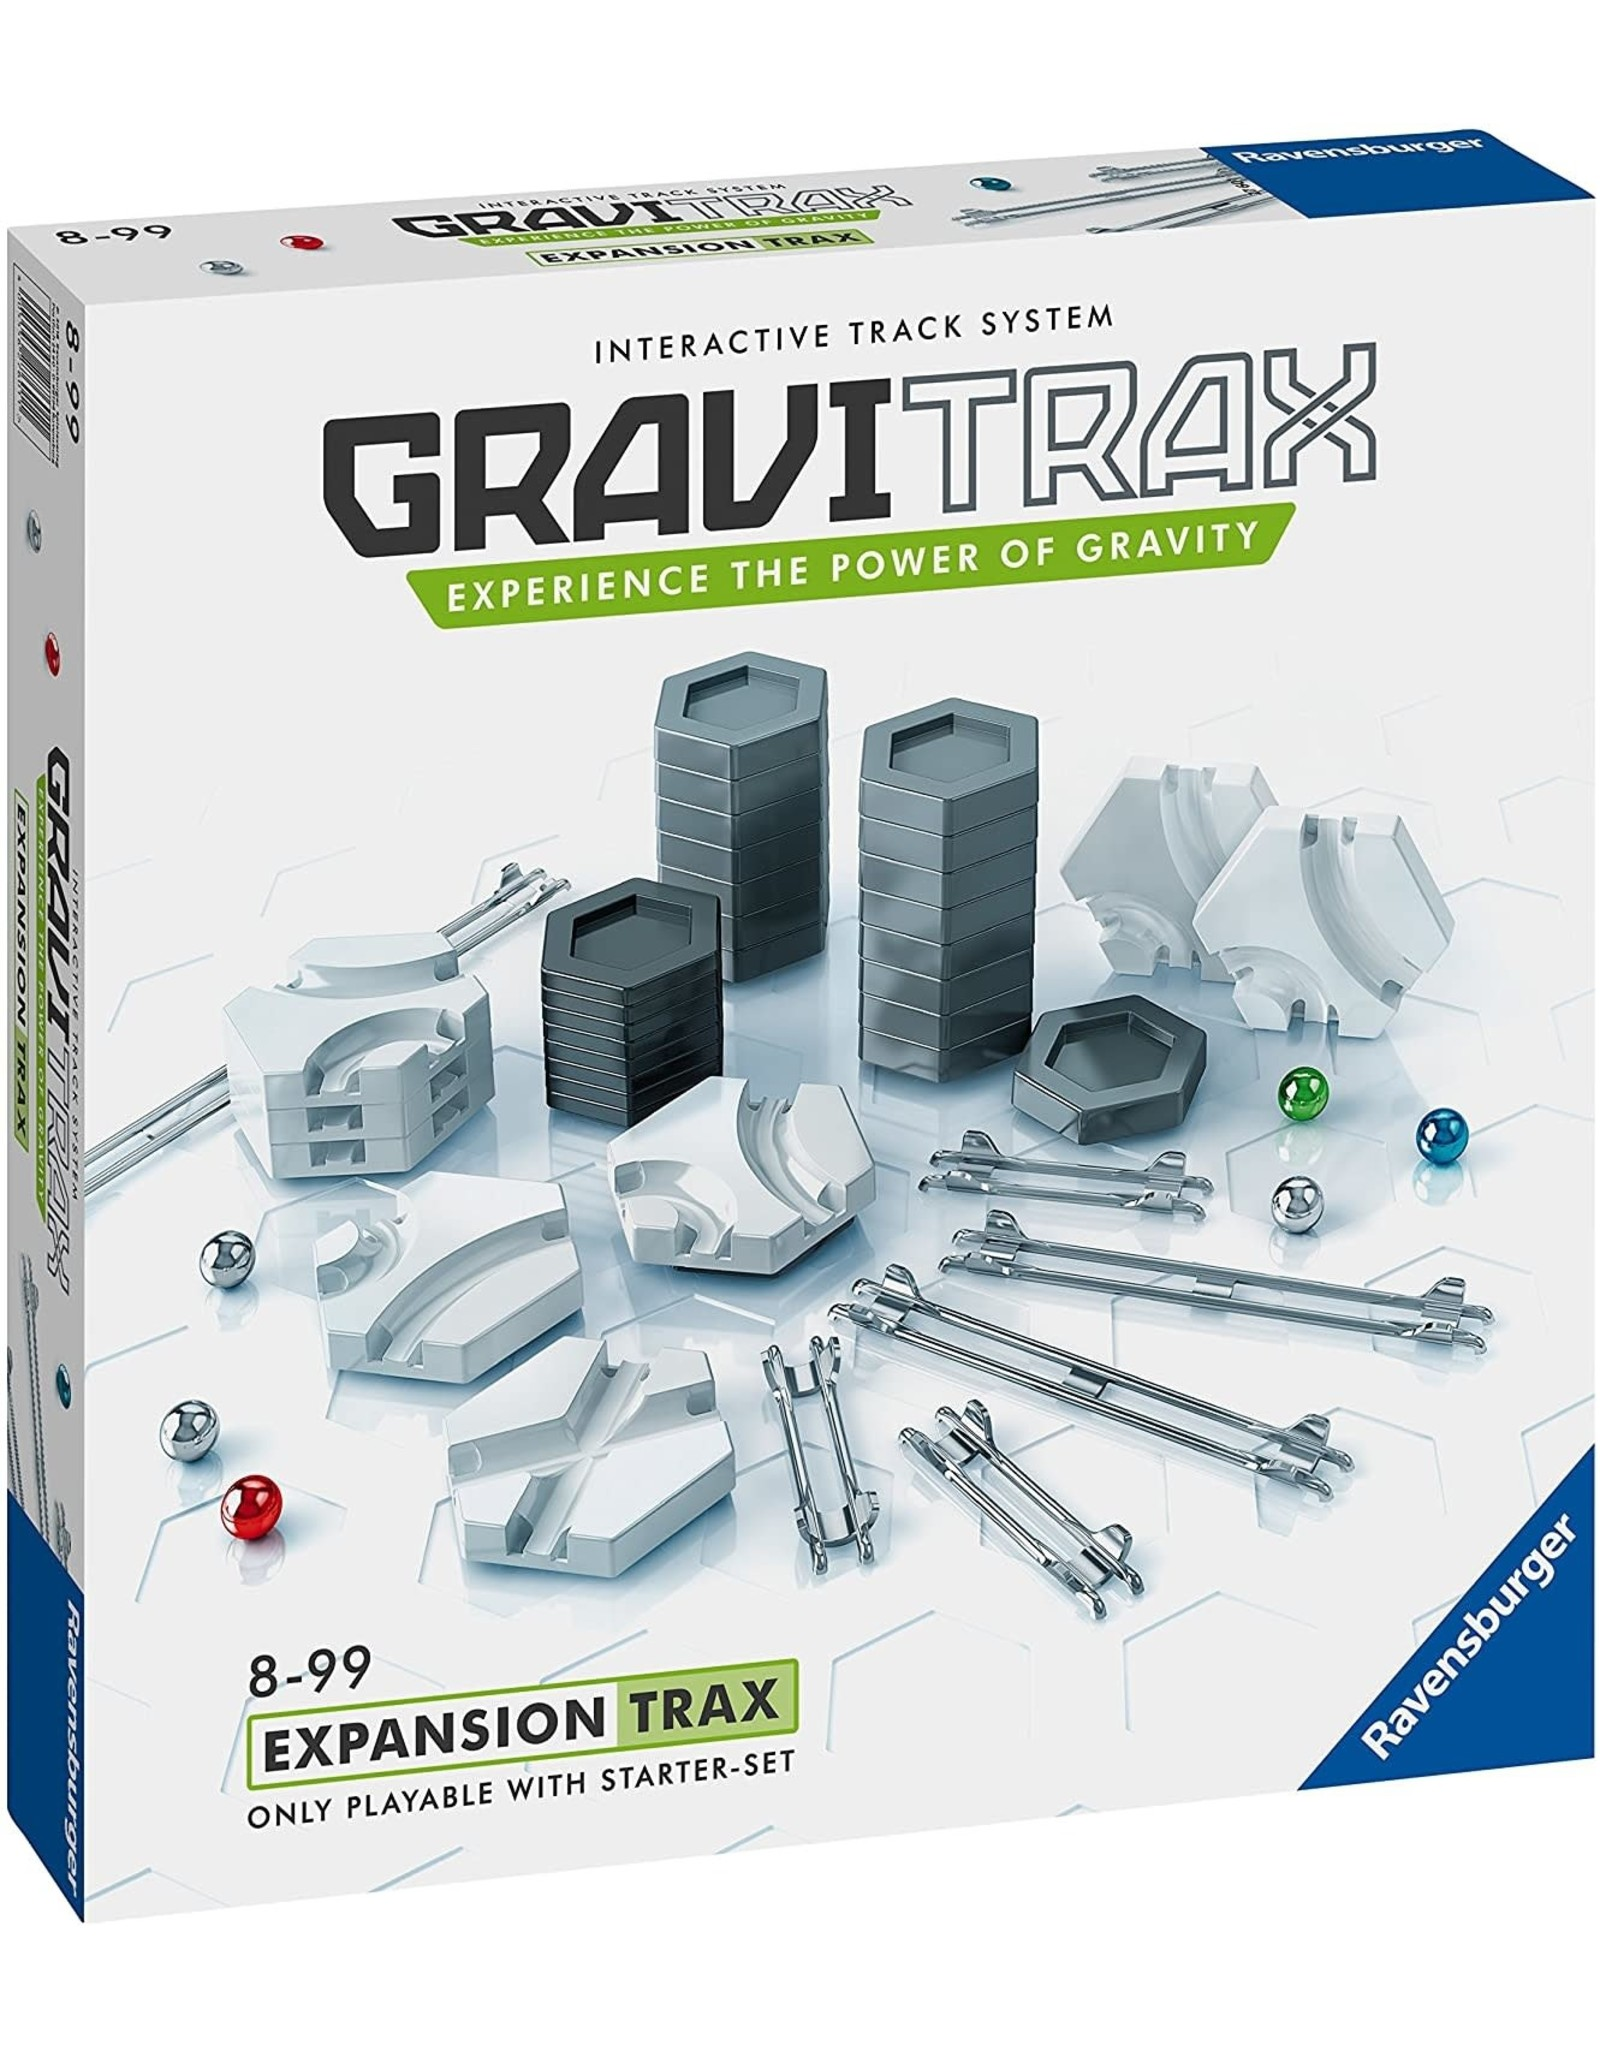 Gravitrax Expansion: Trax